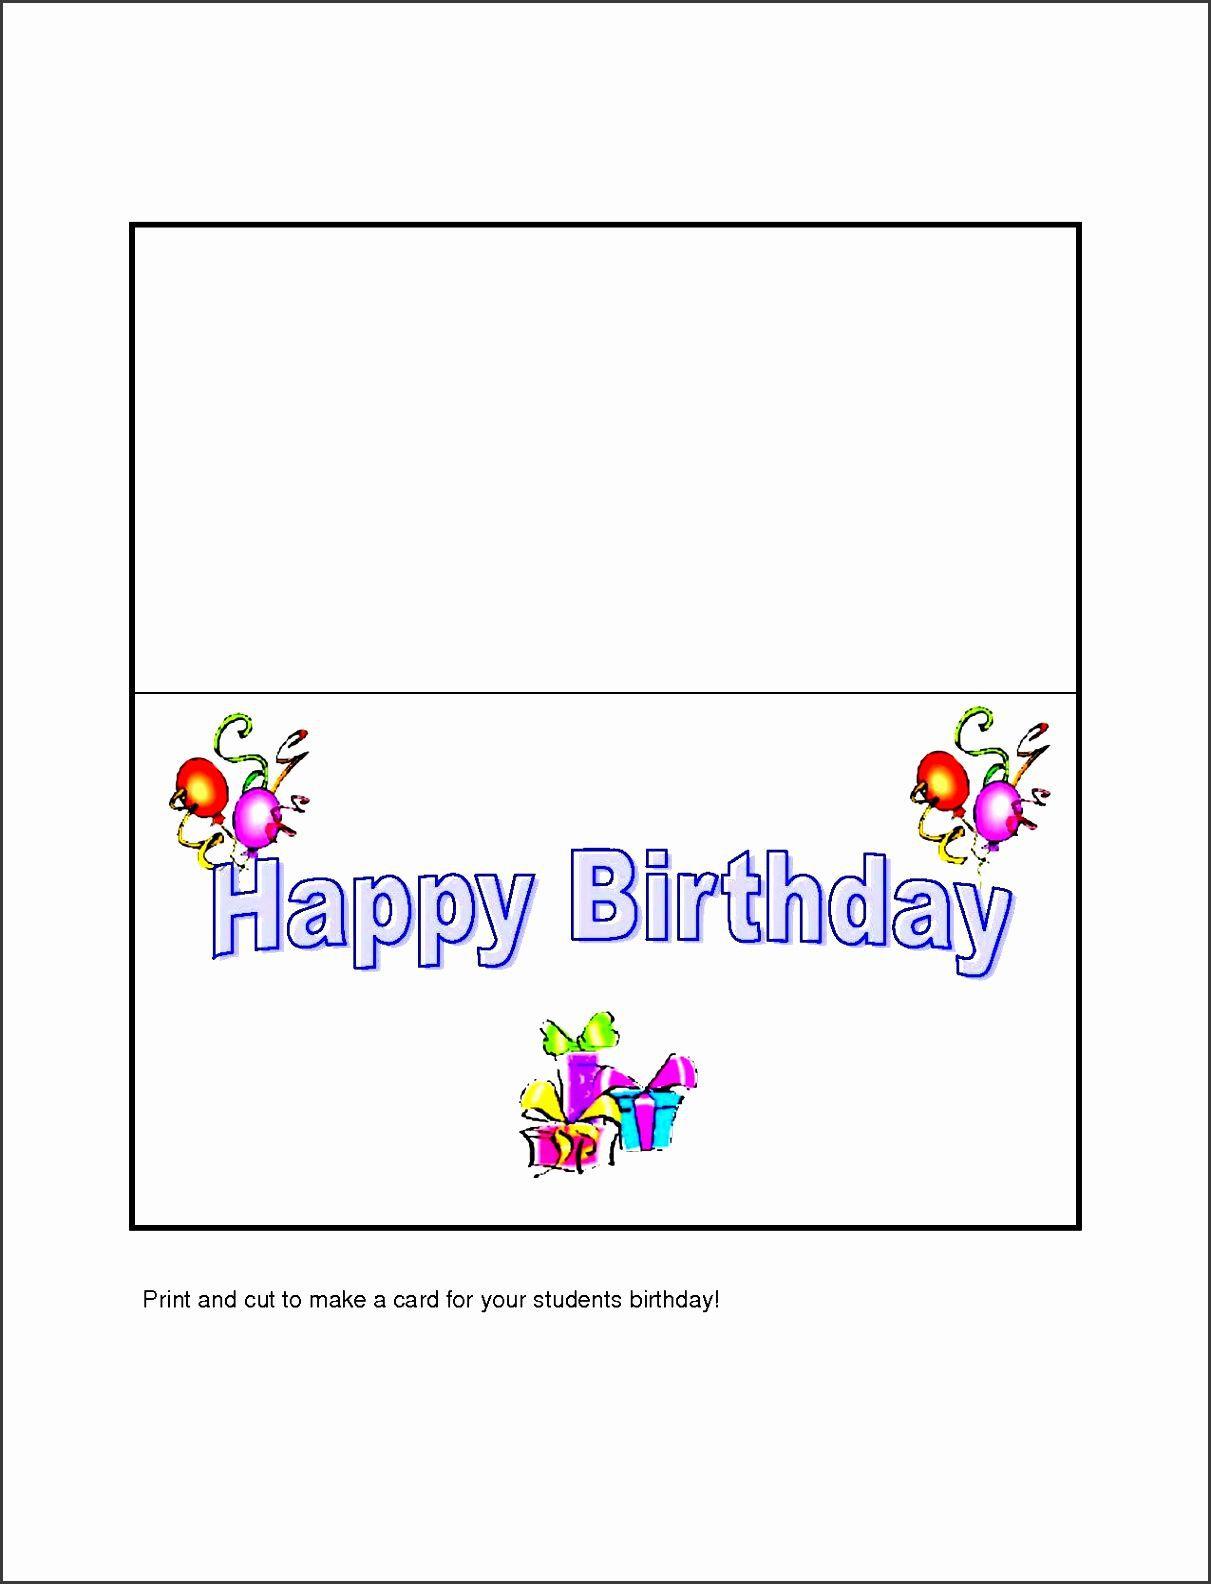 007 Amazing Microsoft Word Greeting Card Template Design  Birthday Blank Free 2007Full